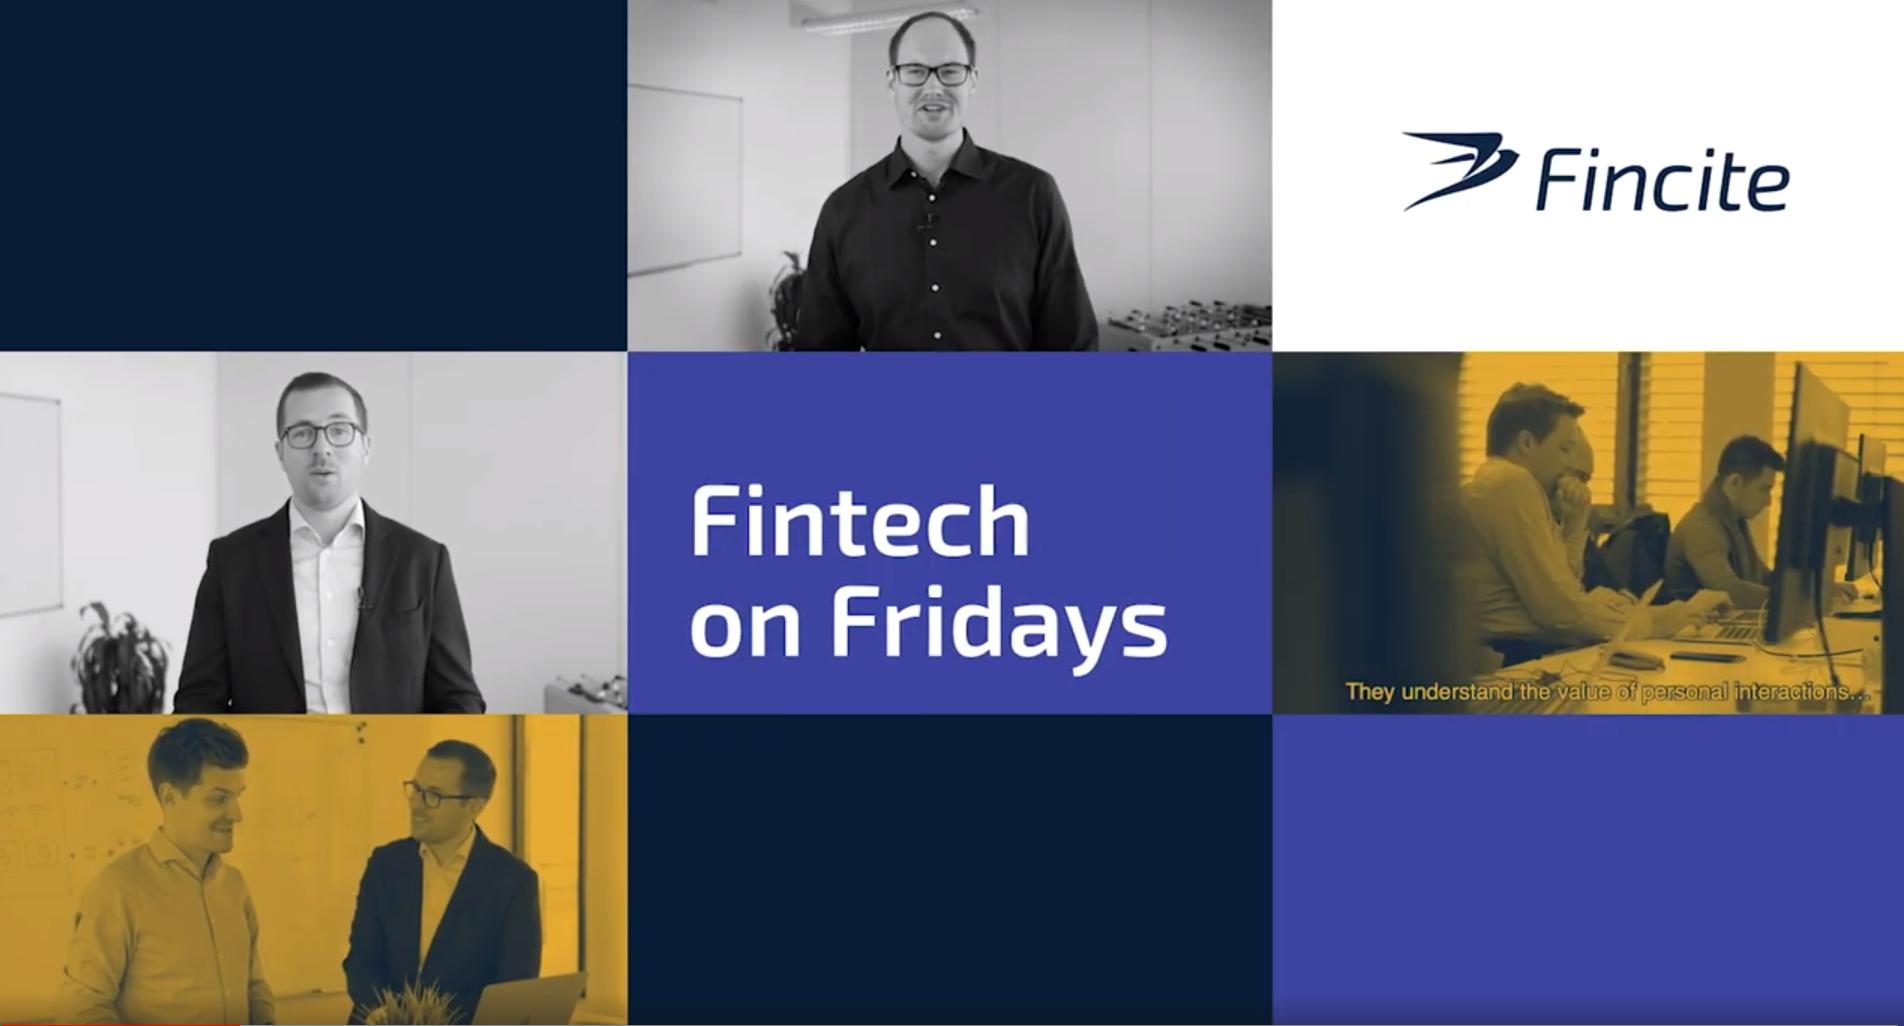 Finanzberatung 2.0: Der Aufstieg der Superberater